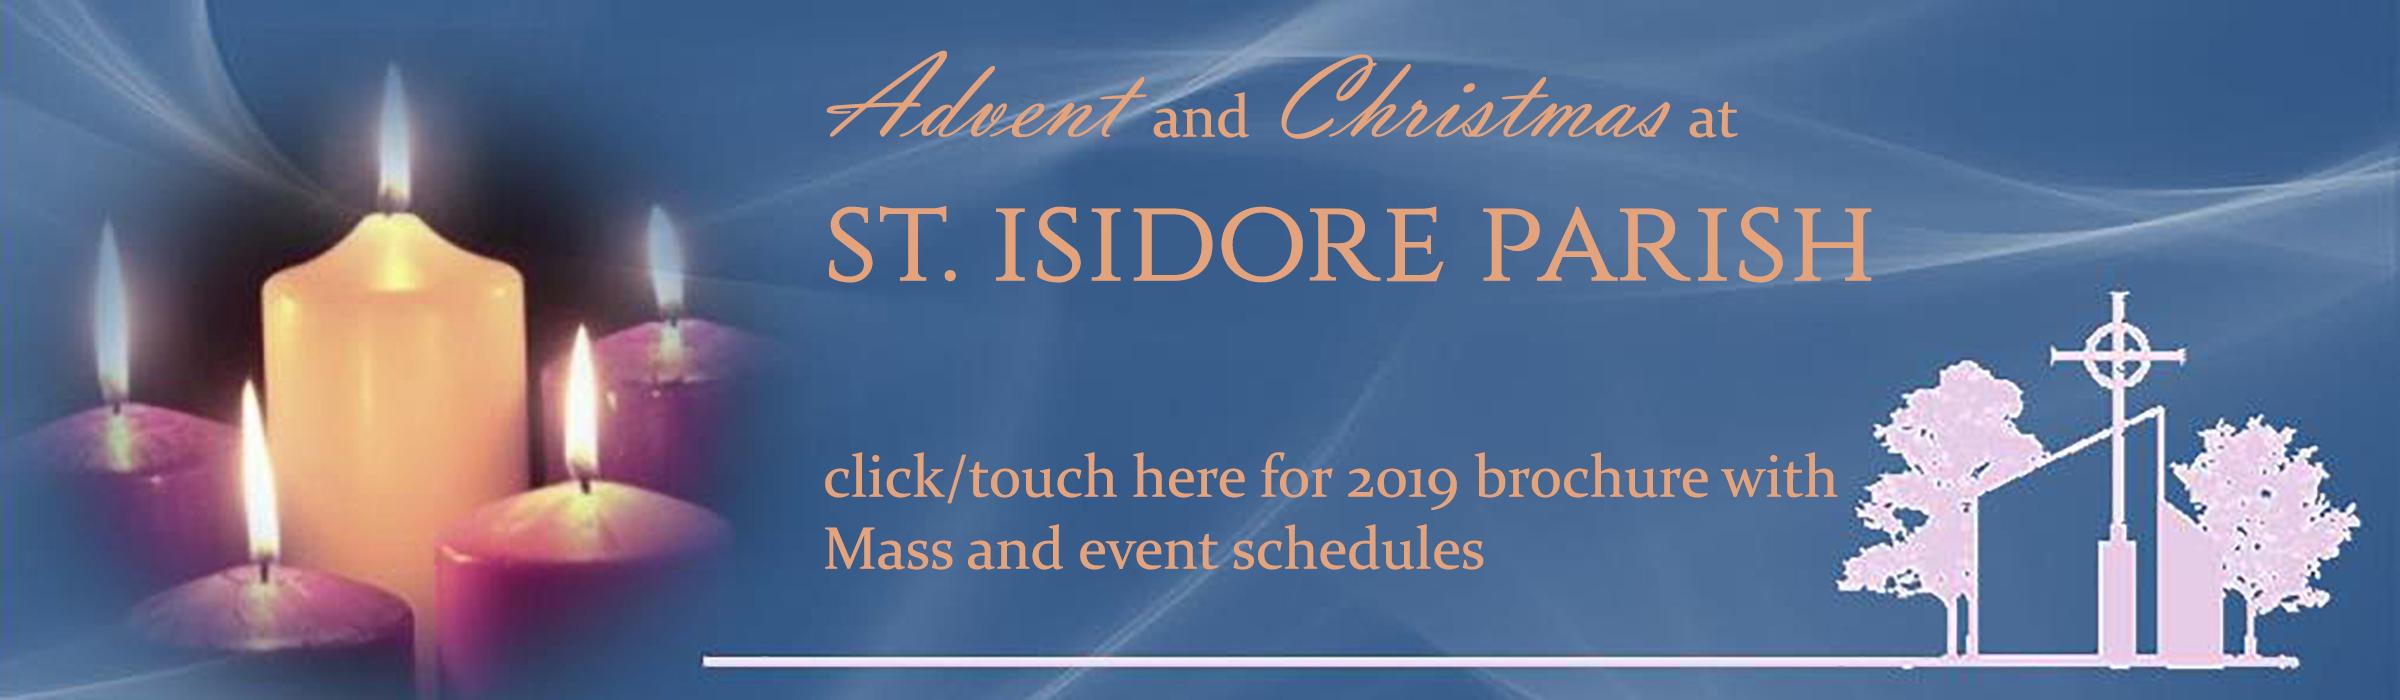 advent brochure 2019 slider